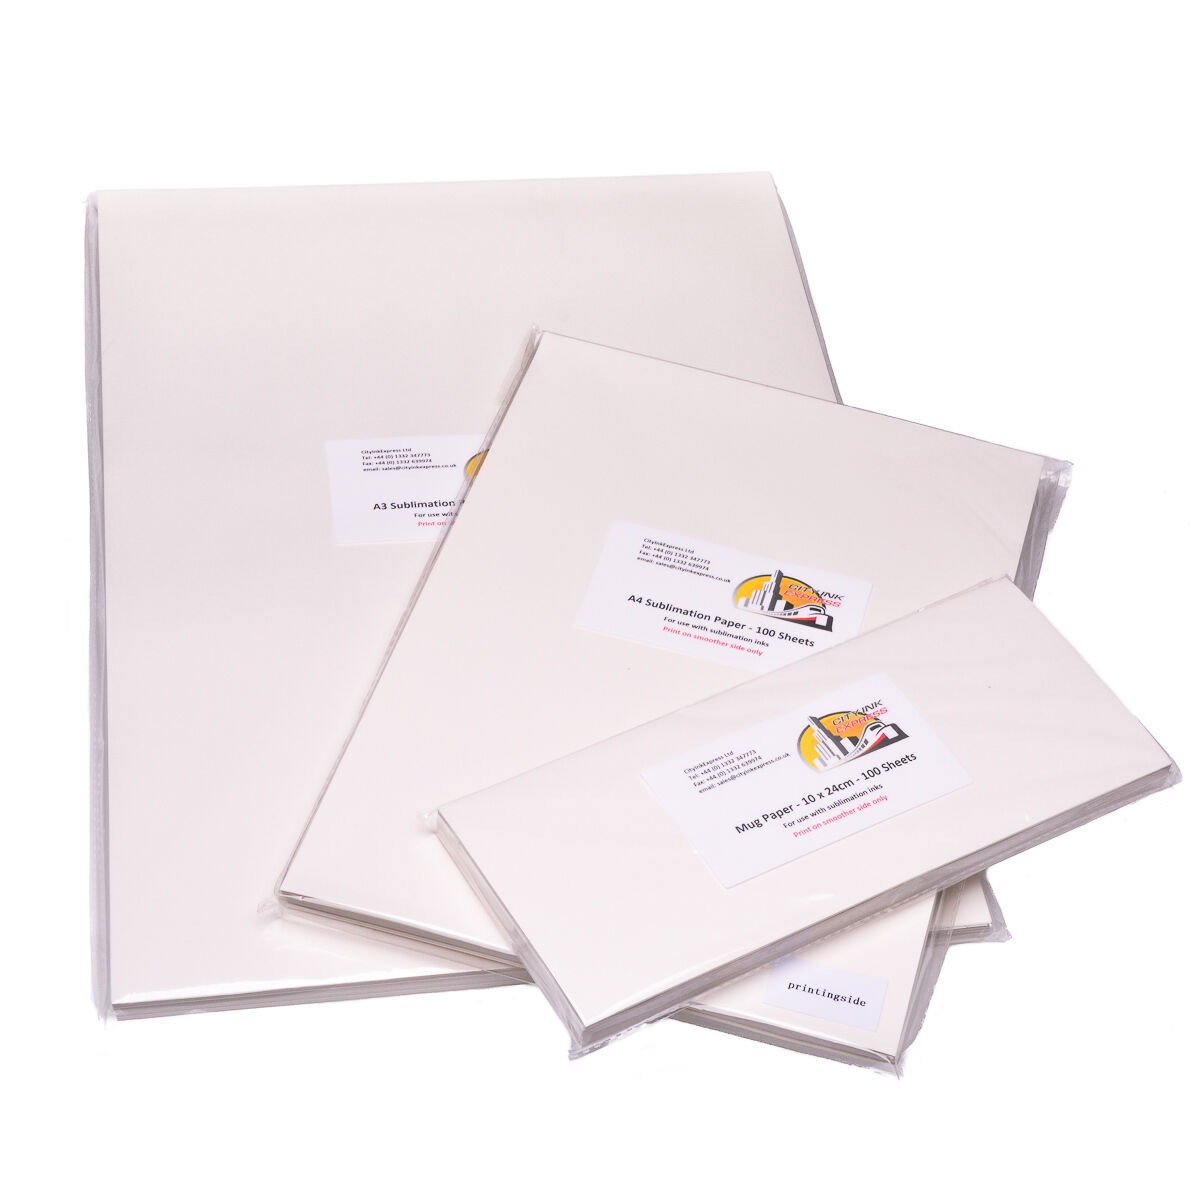 Dye Sublimation Paper for Epson Stylus R265 printer